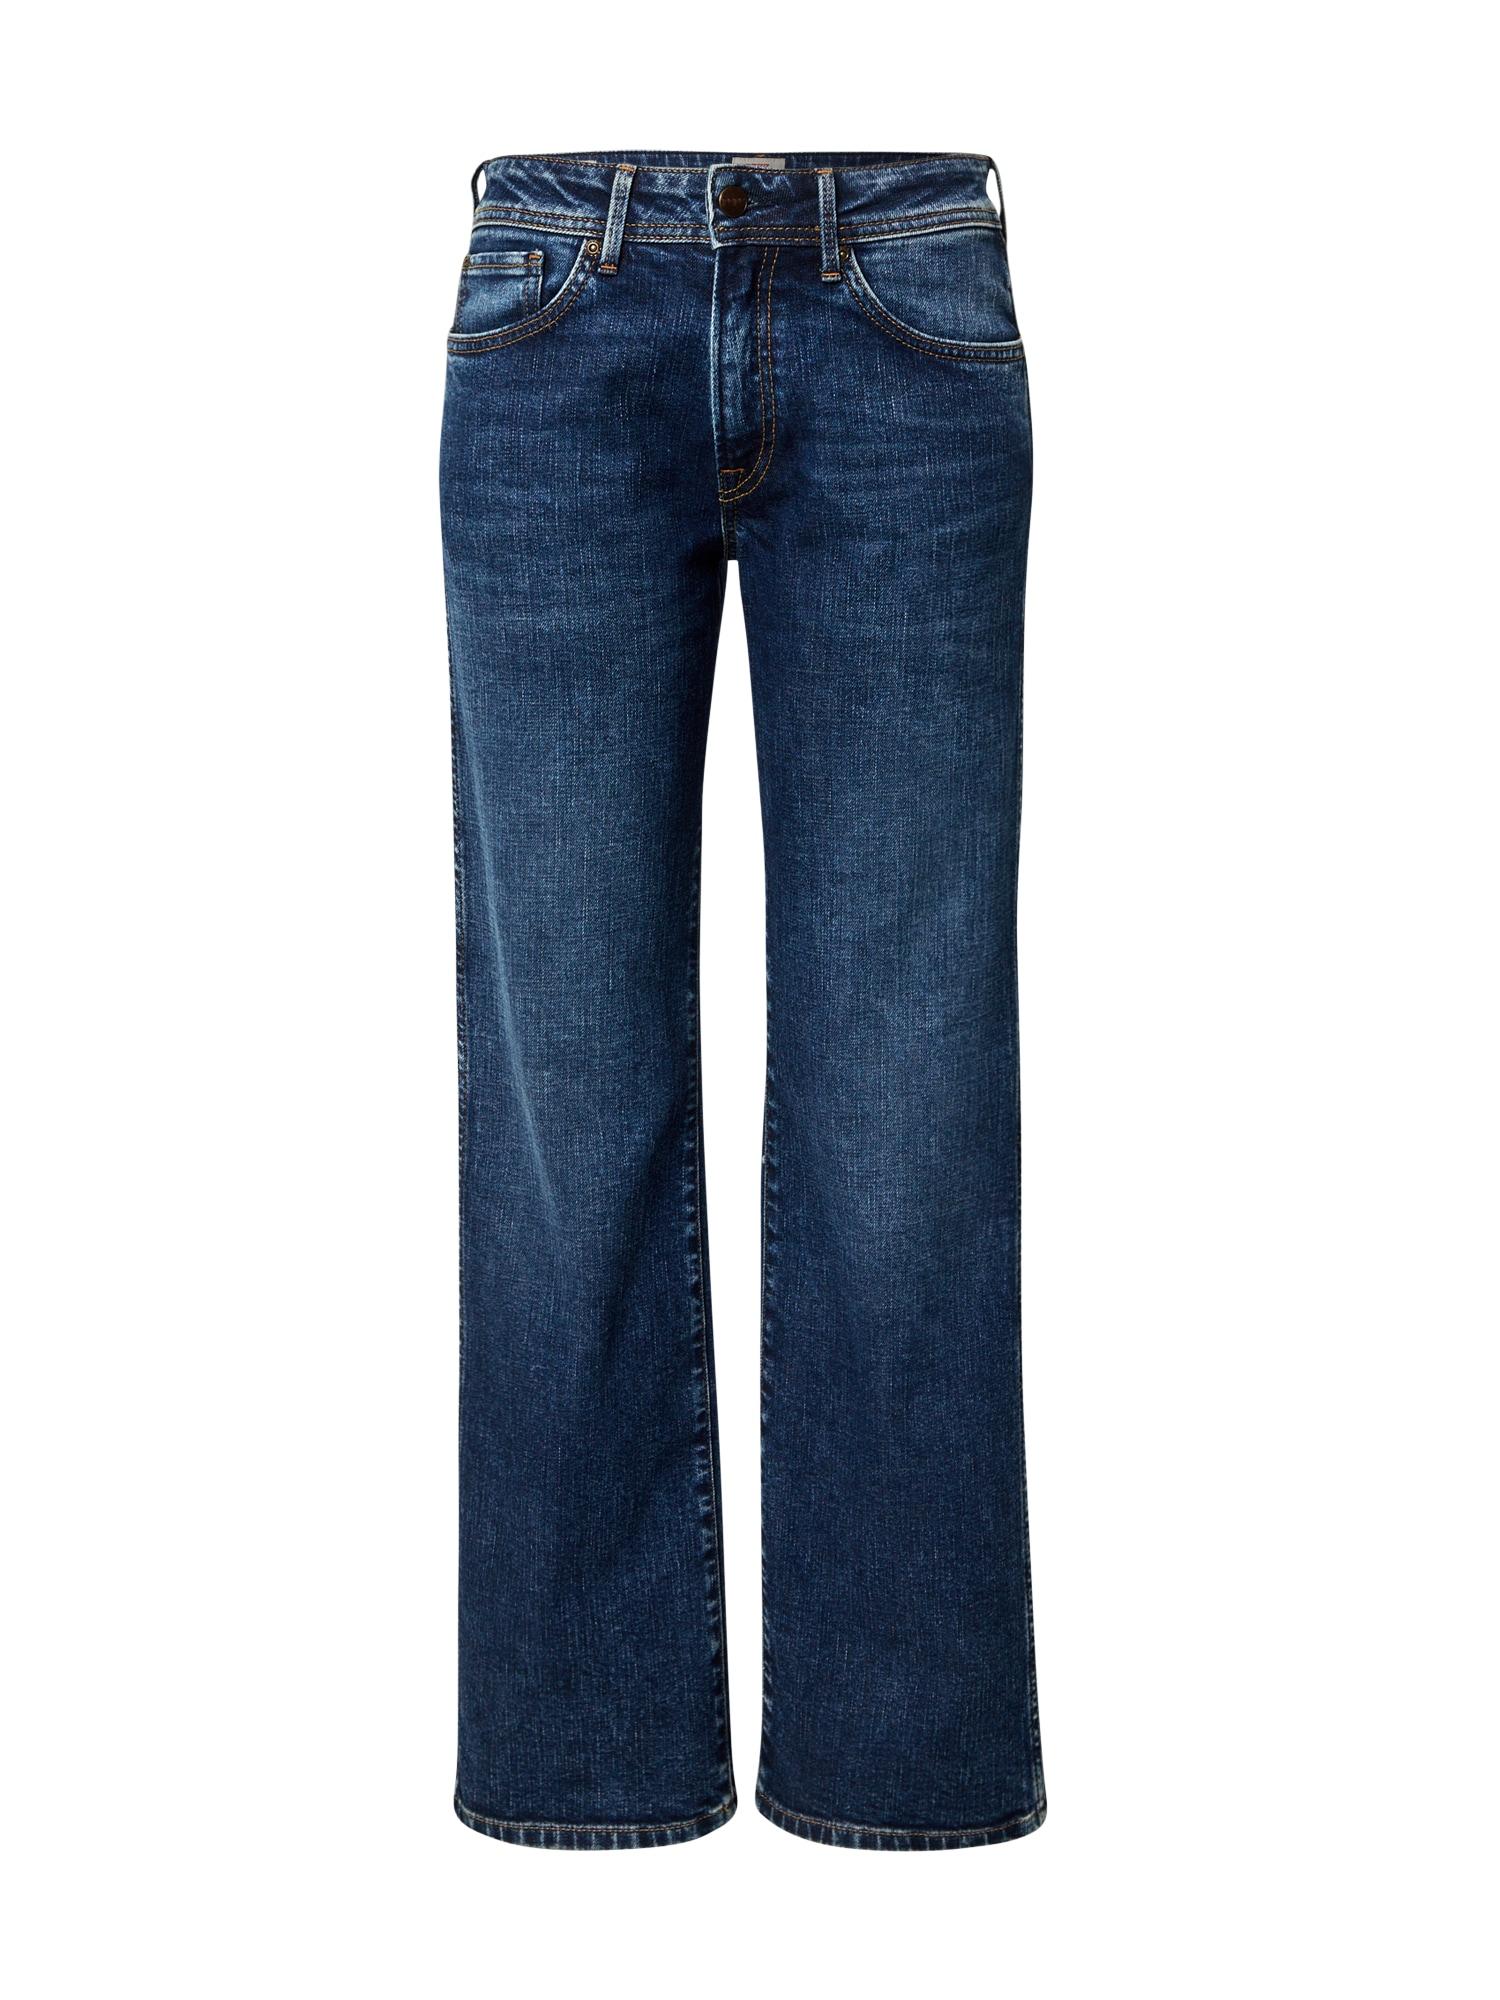 Pepe Jeans Džínsy 'NEW OLYMPIA'  modrá denim